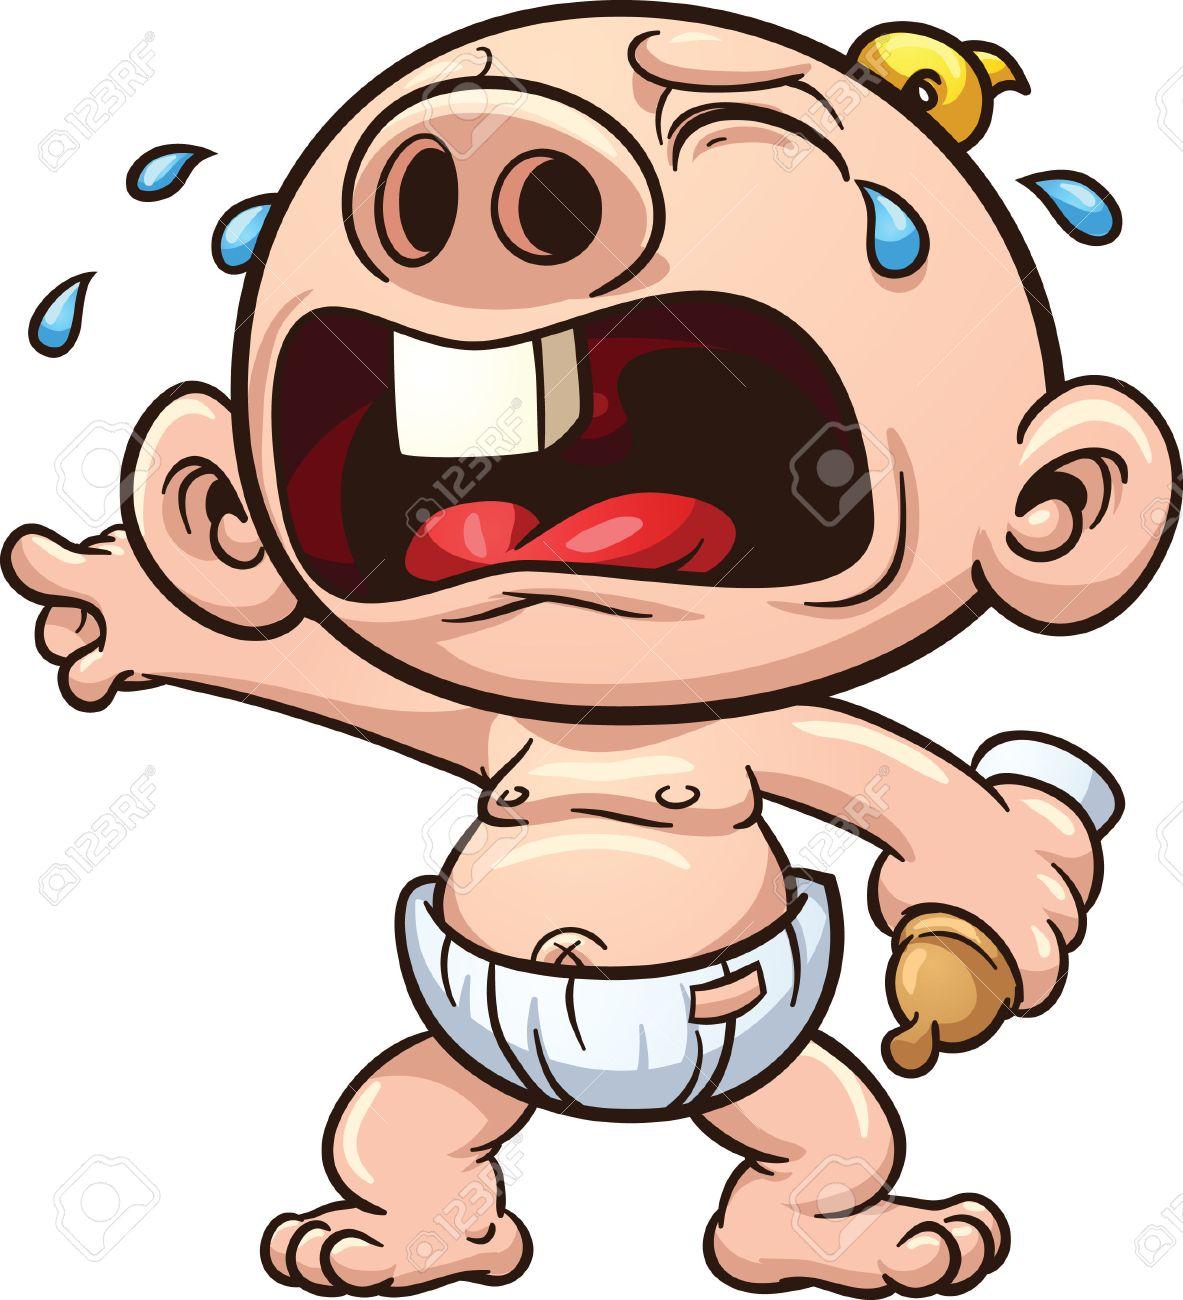 Cartoon baby crying illustration - 31491518